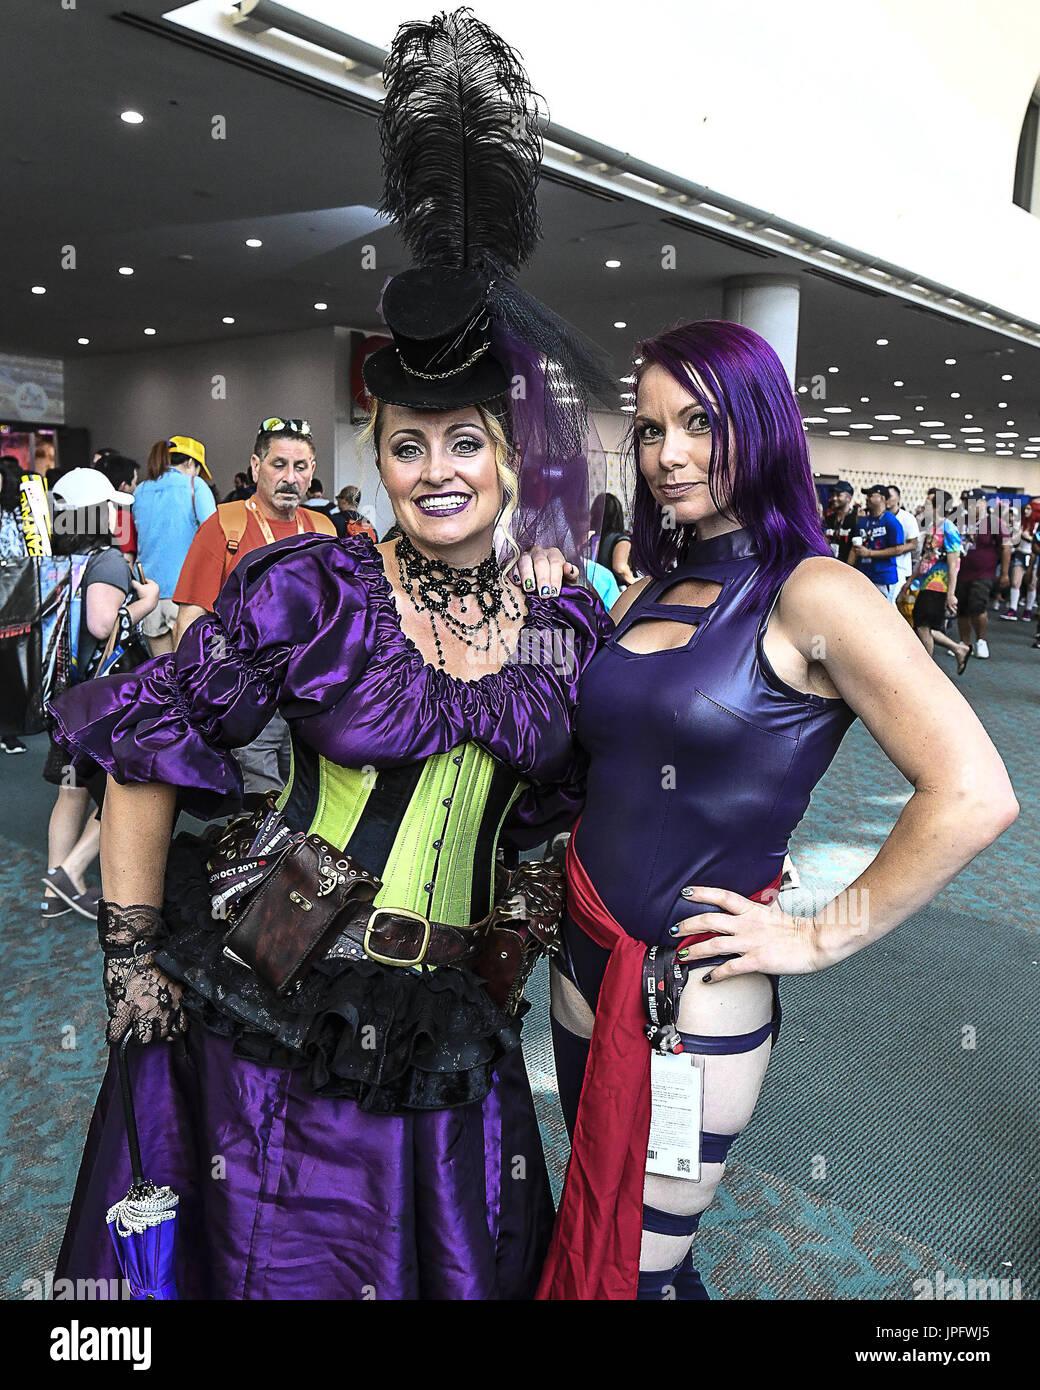 San Diego Ca Usa 22nd July 2017 Comic Con International 2017 Stock Photo Alamy